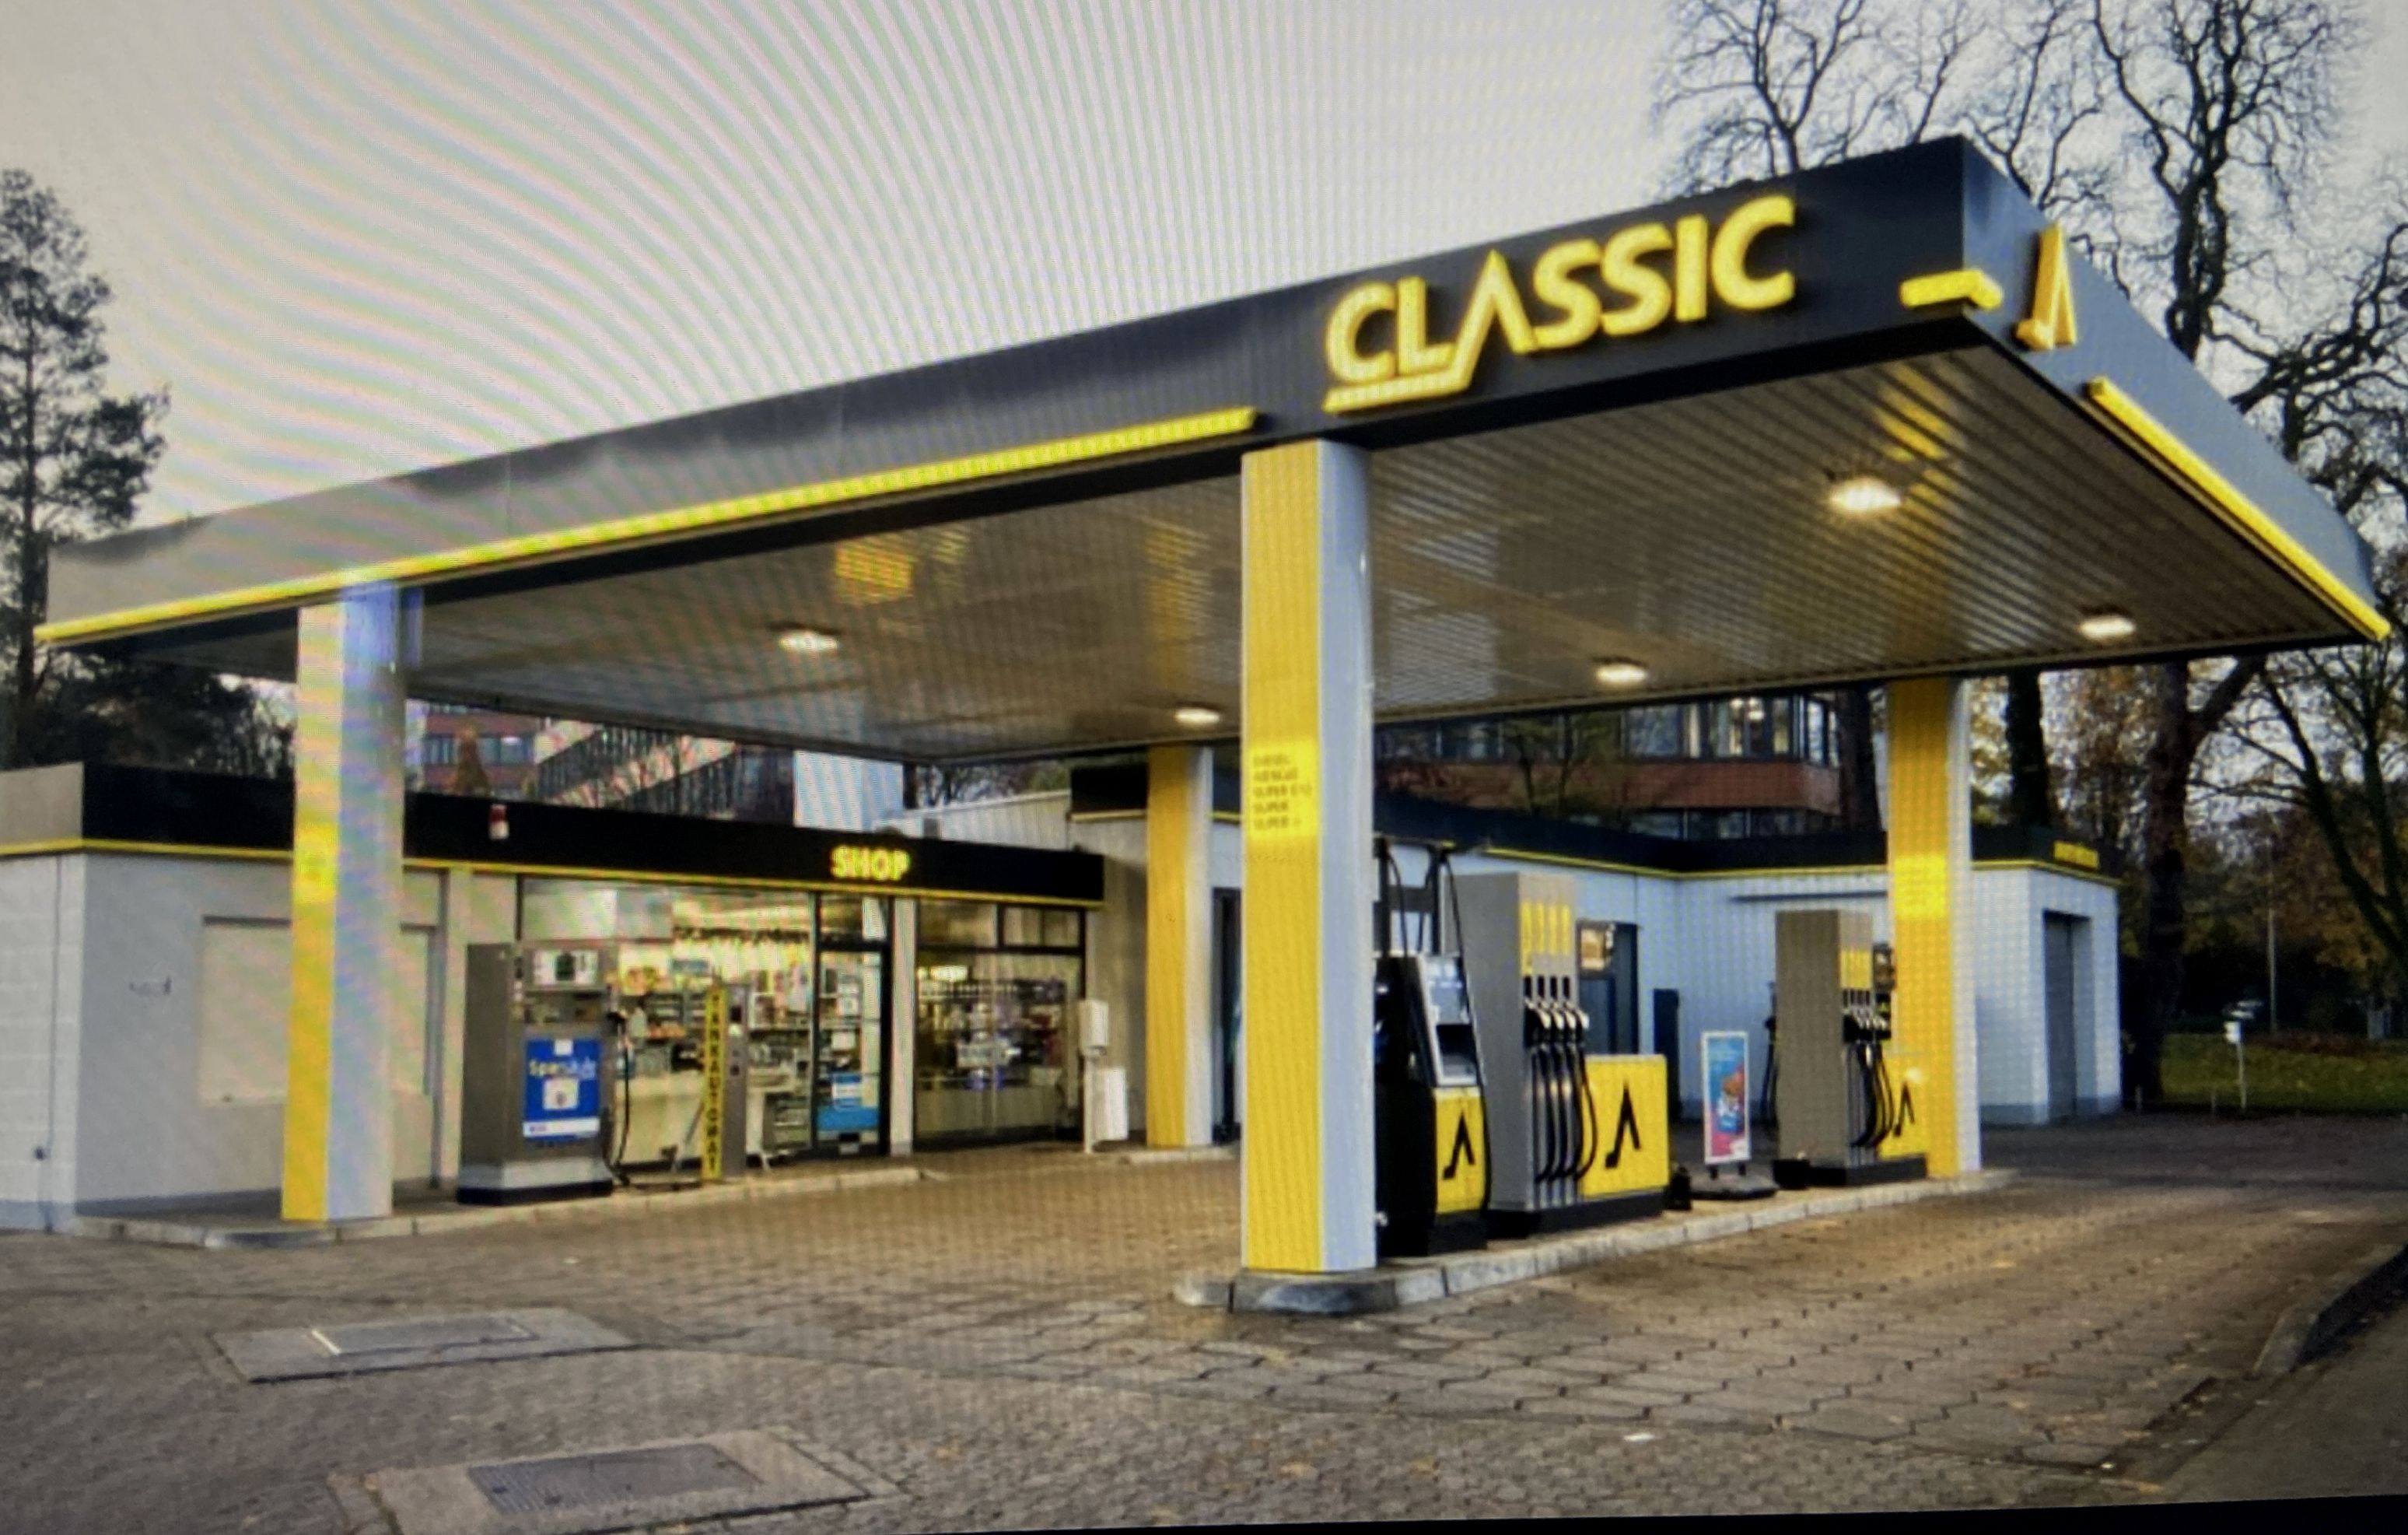 Classic Tankstelle